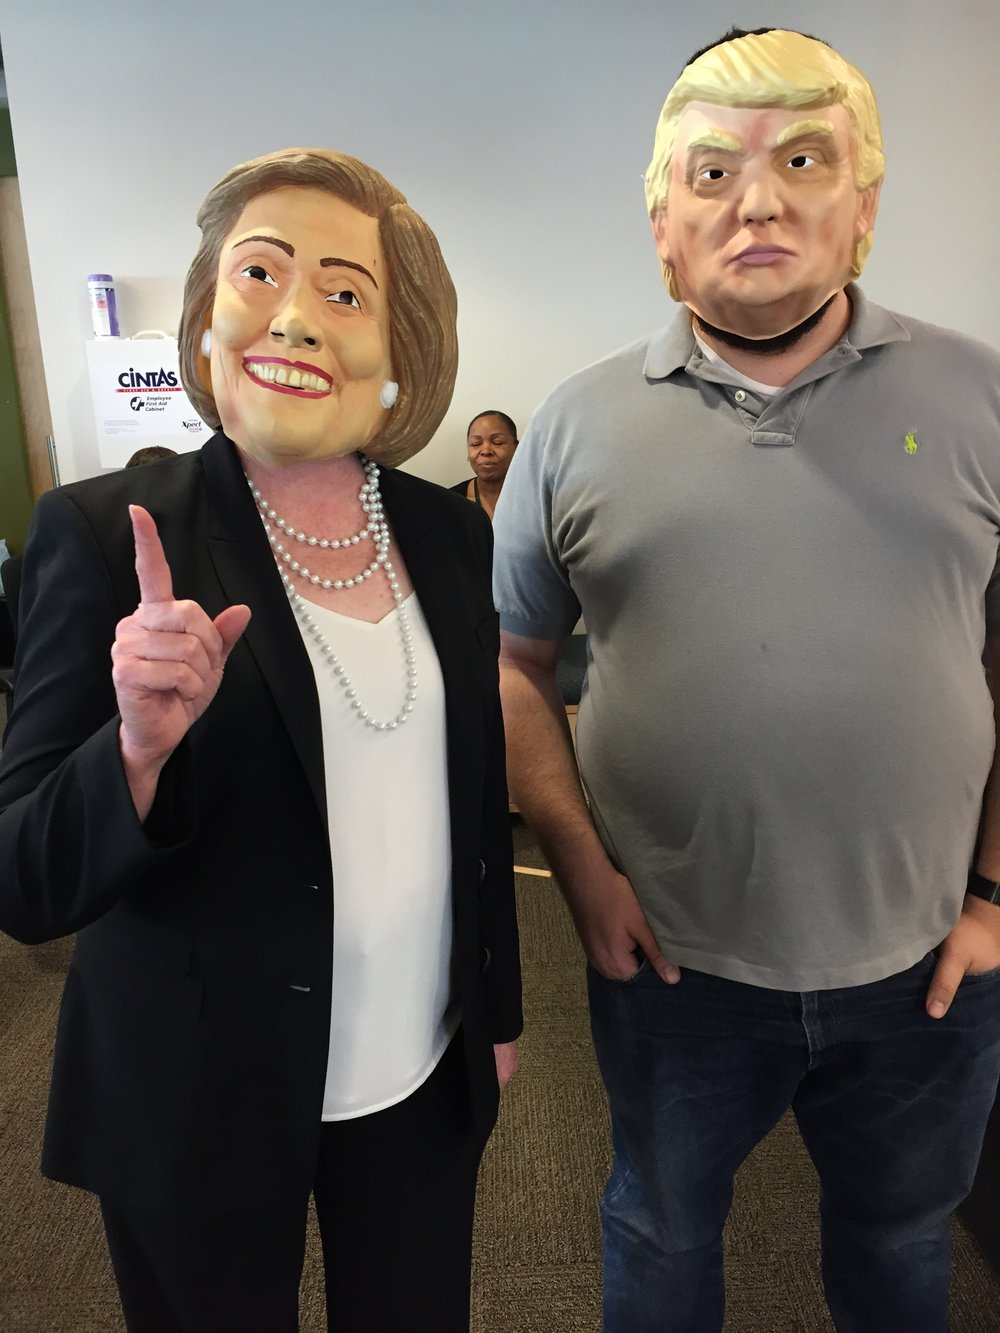 Hillary Trump.JPG